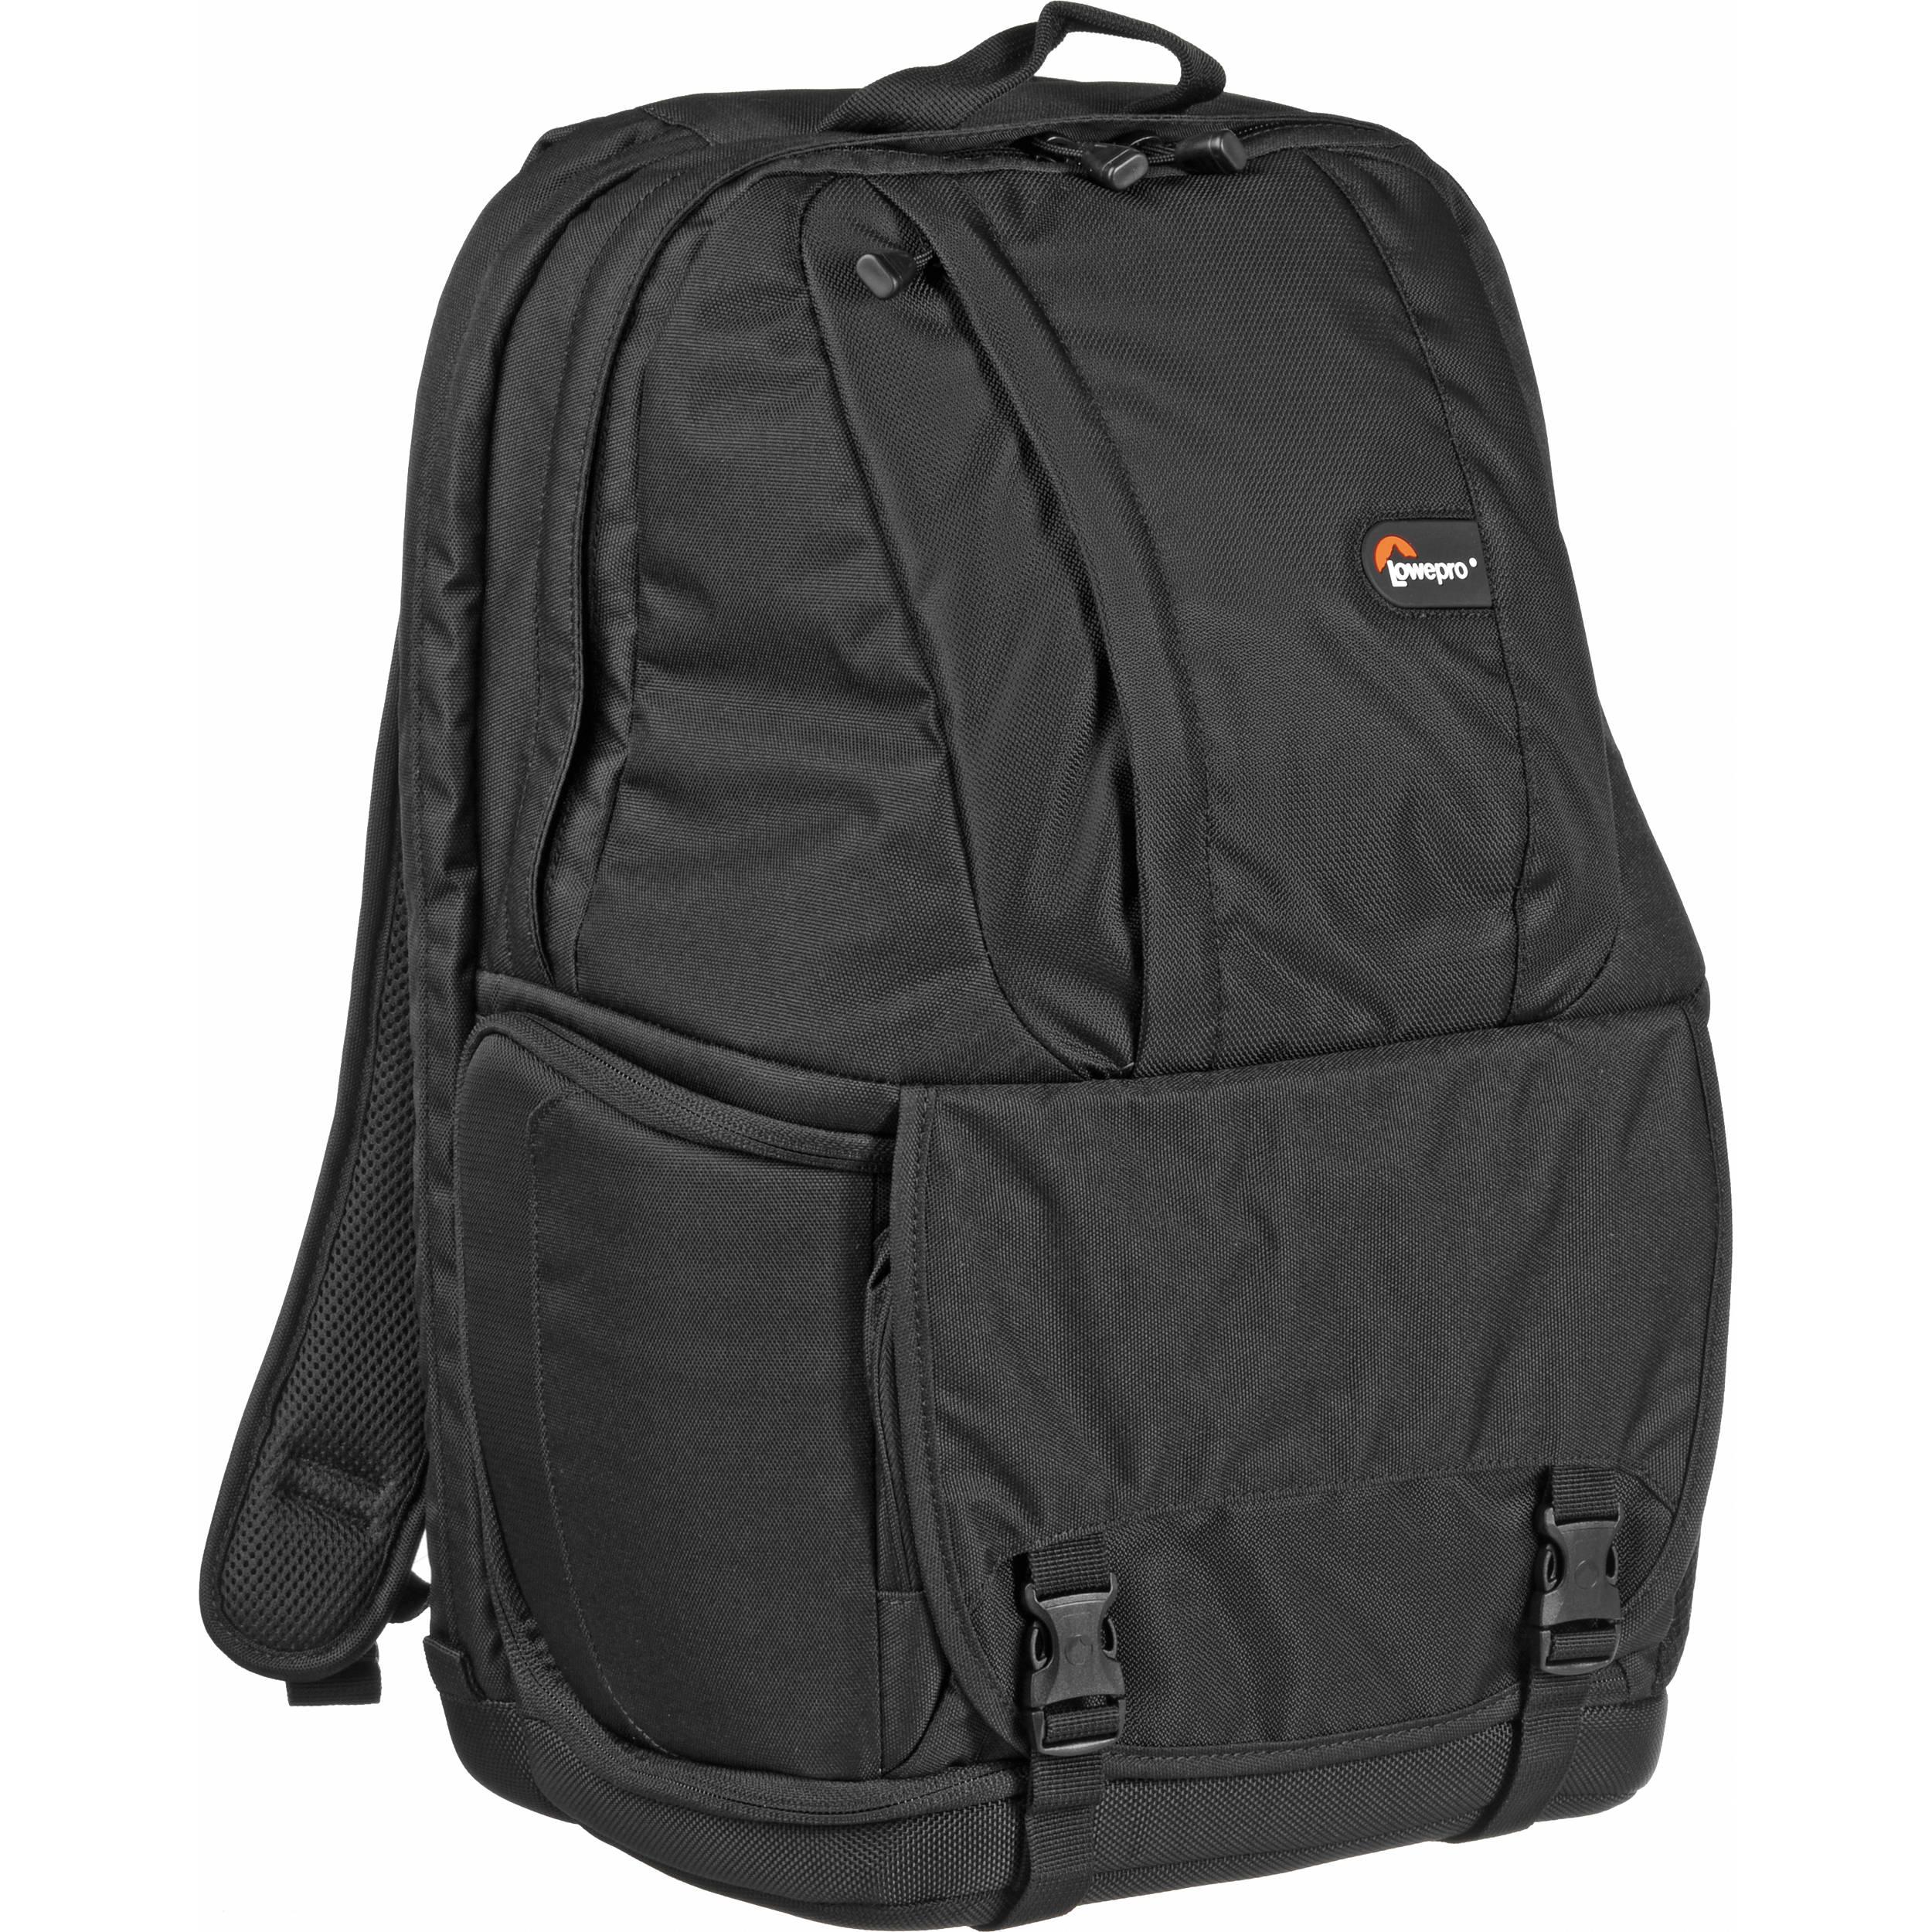 ae0de57d48 Lowepro Fastpack 350 Backpack (Black) LP35197 B H Photo Video